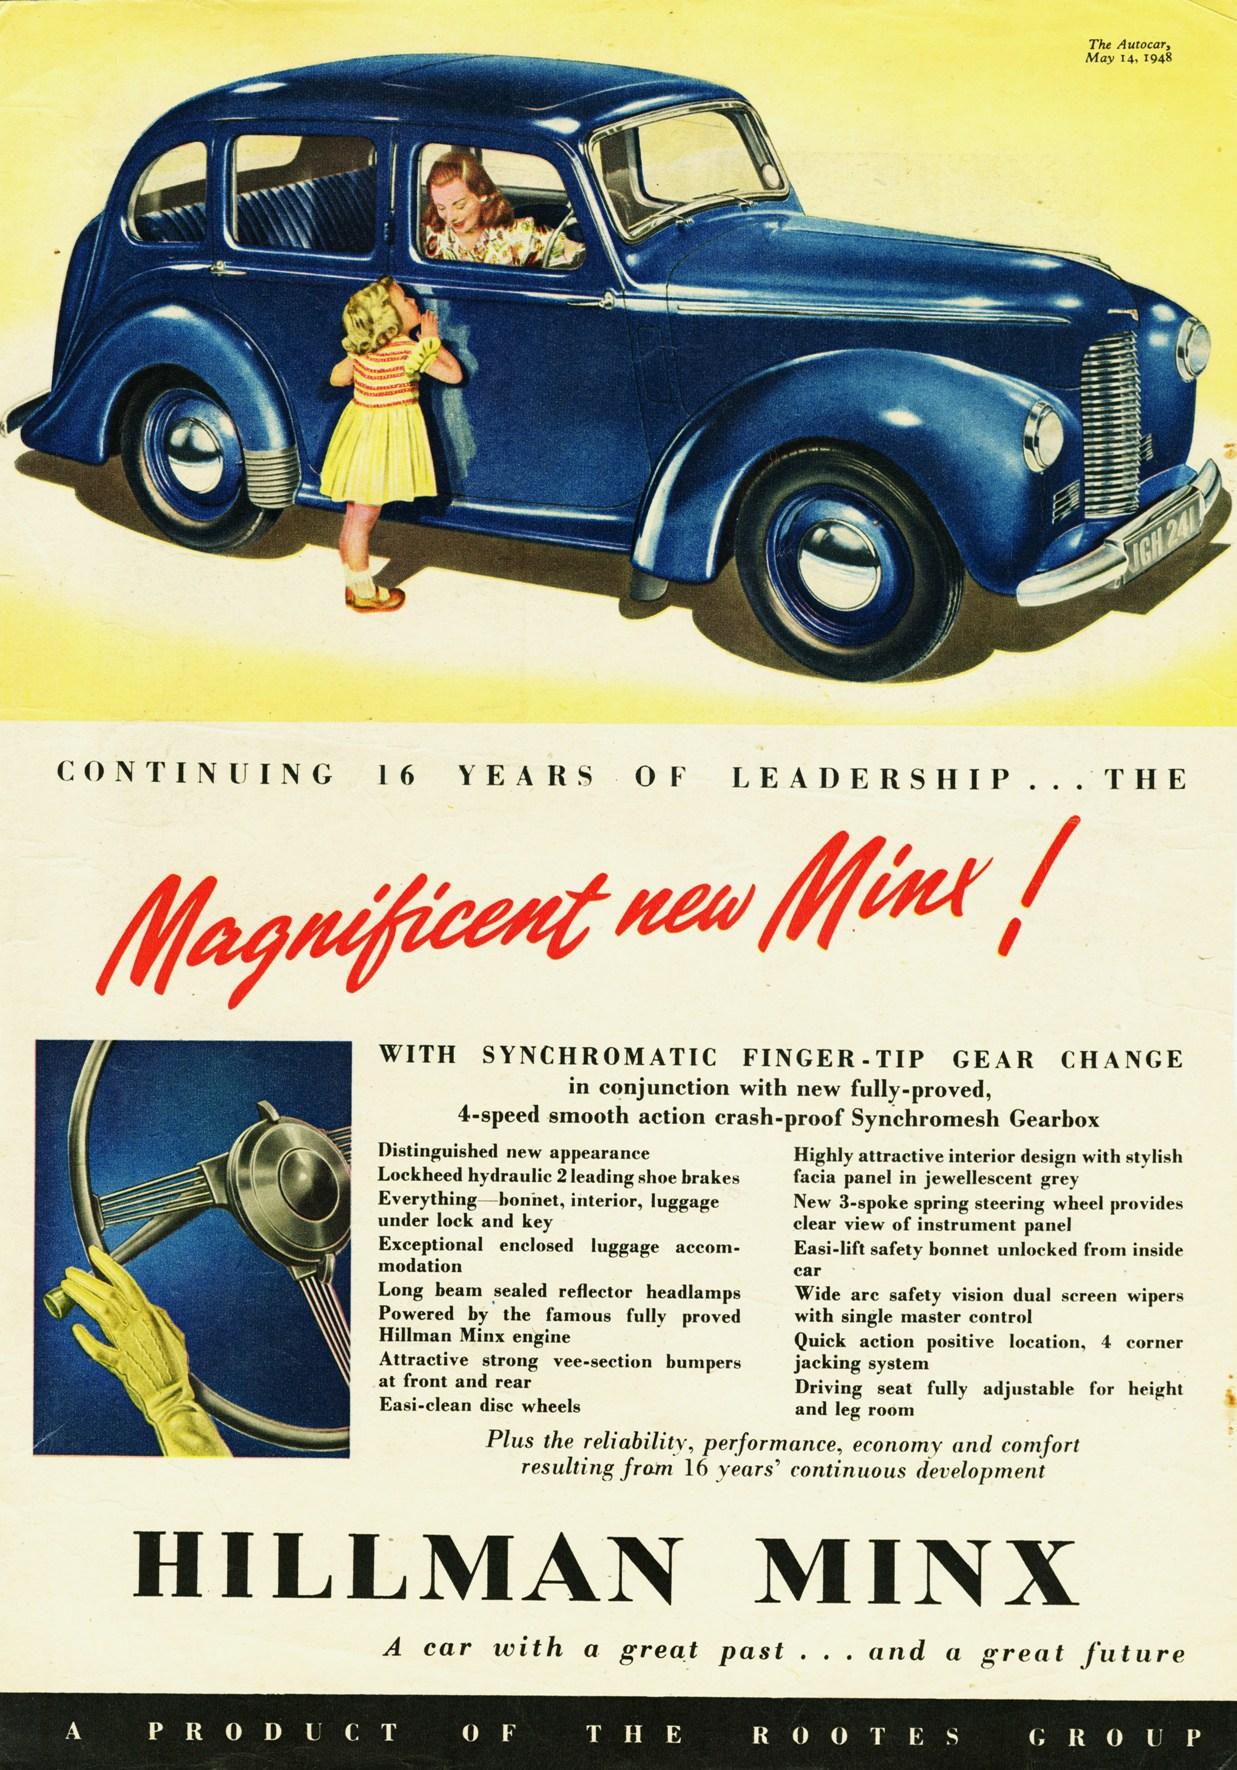 File:1948 Hillman Minx ad.jpg